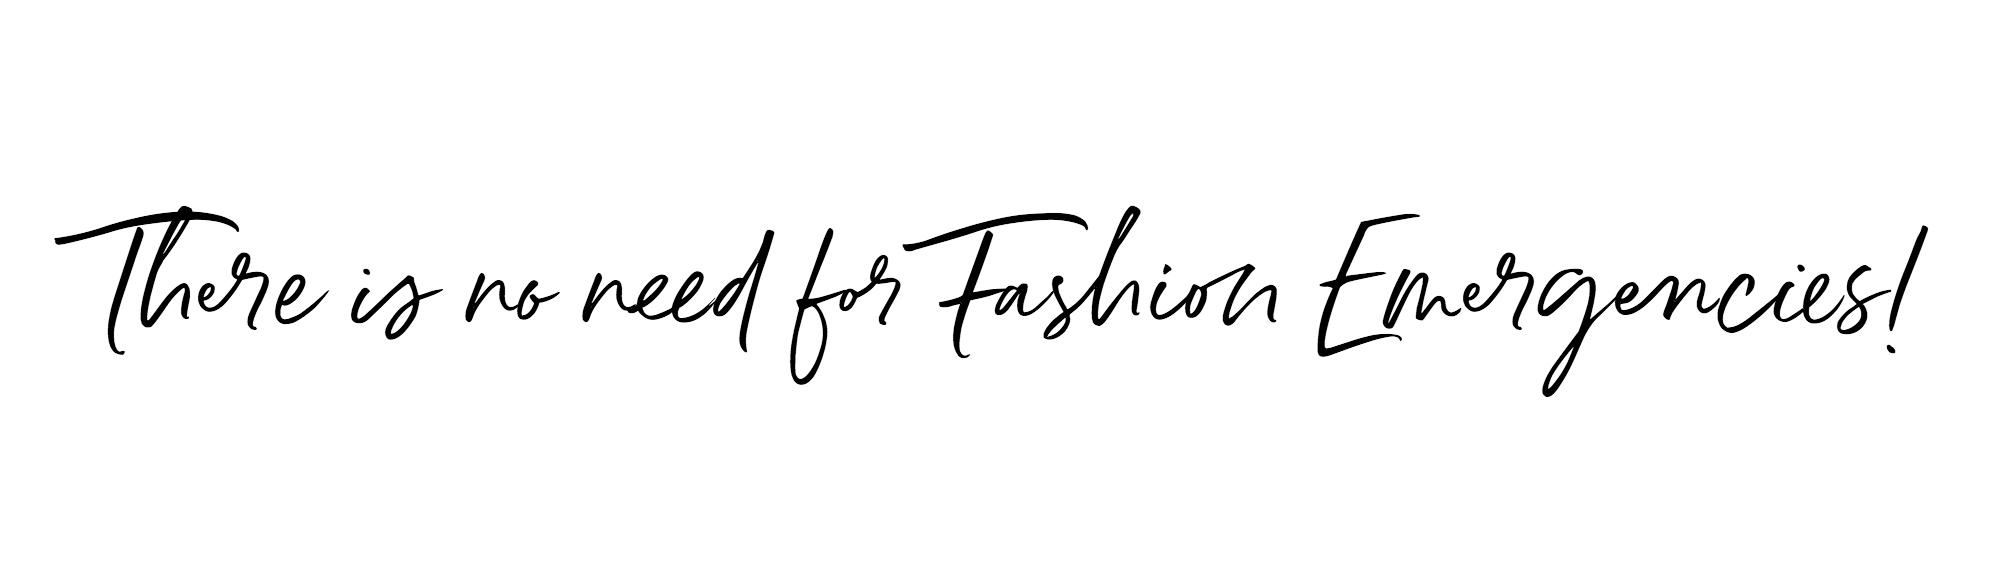 bock_mode_fashion_emergencies.jpg